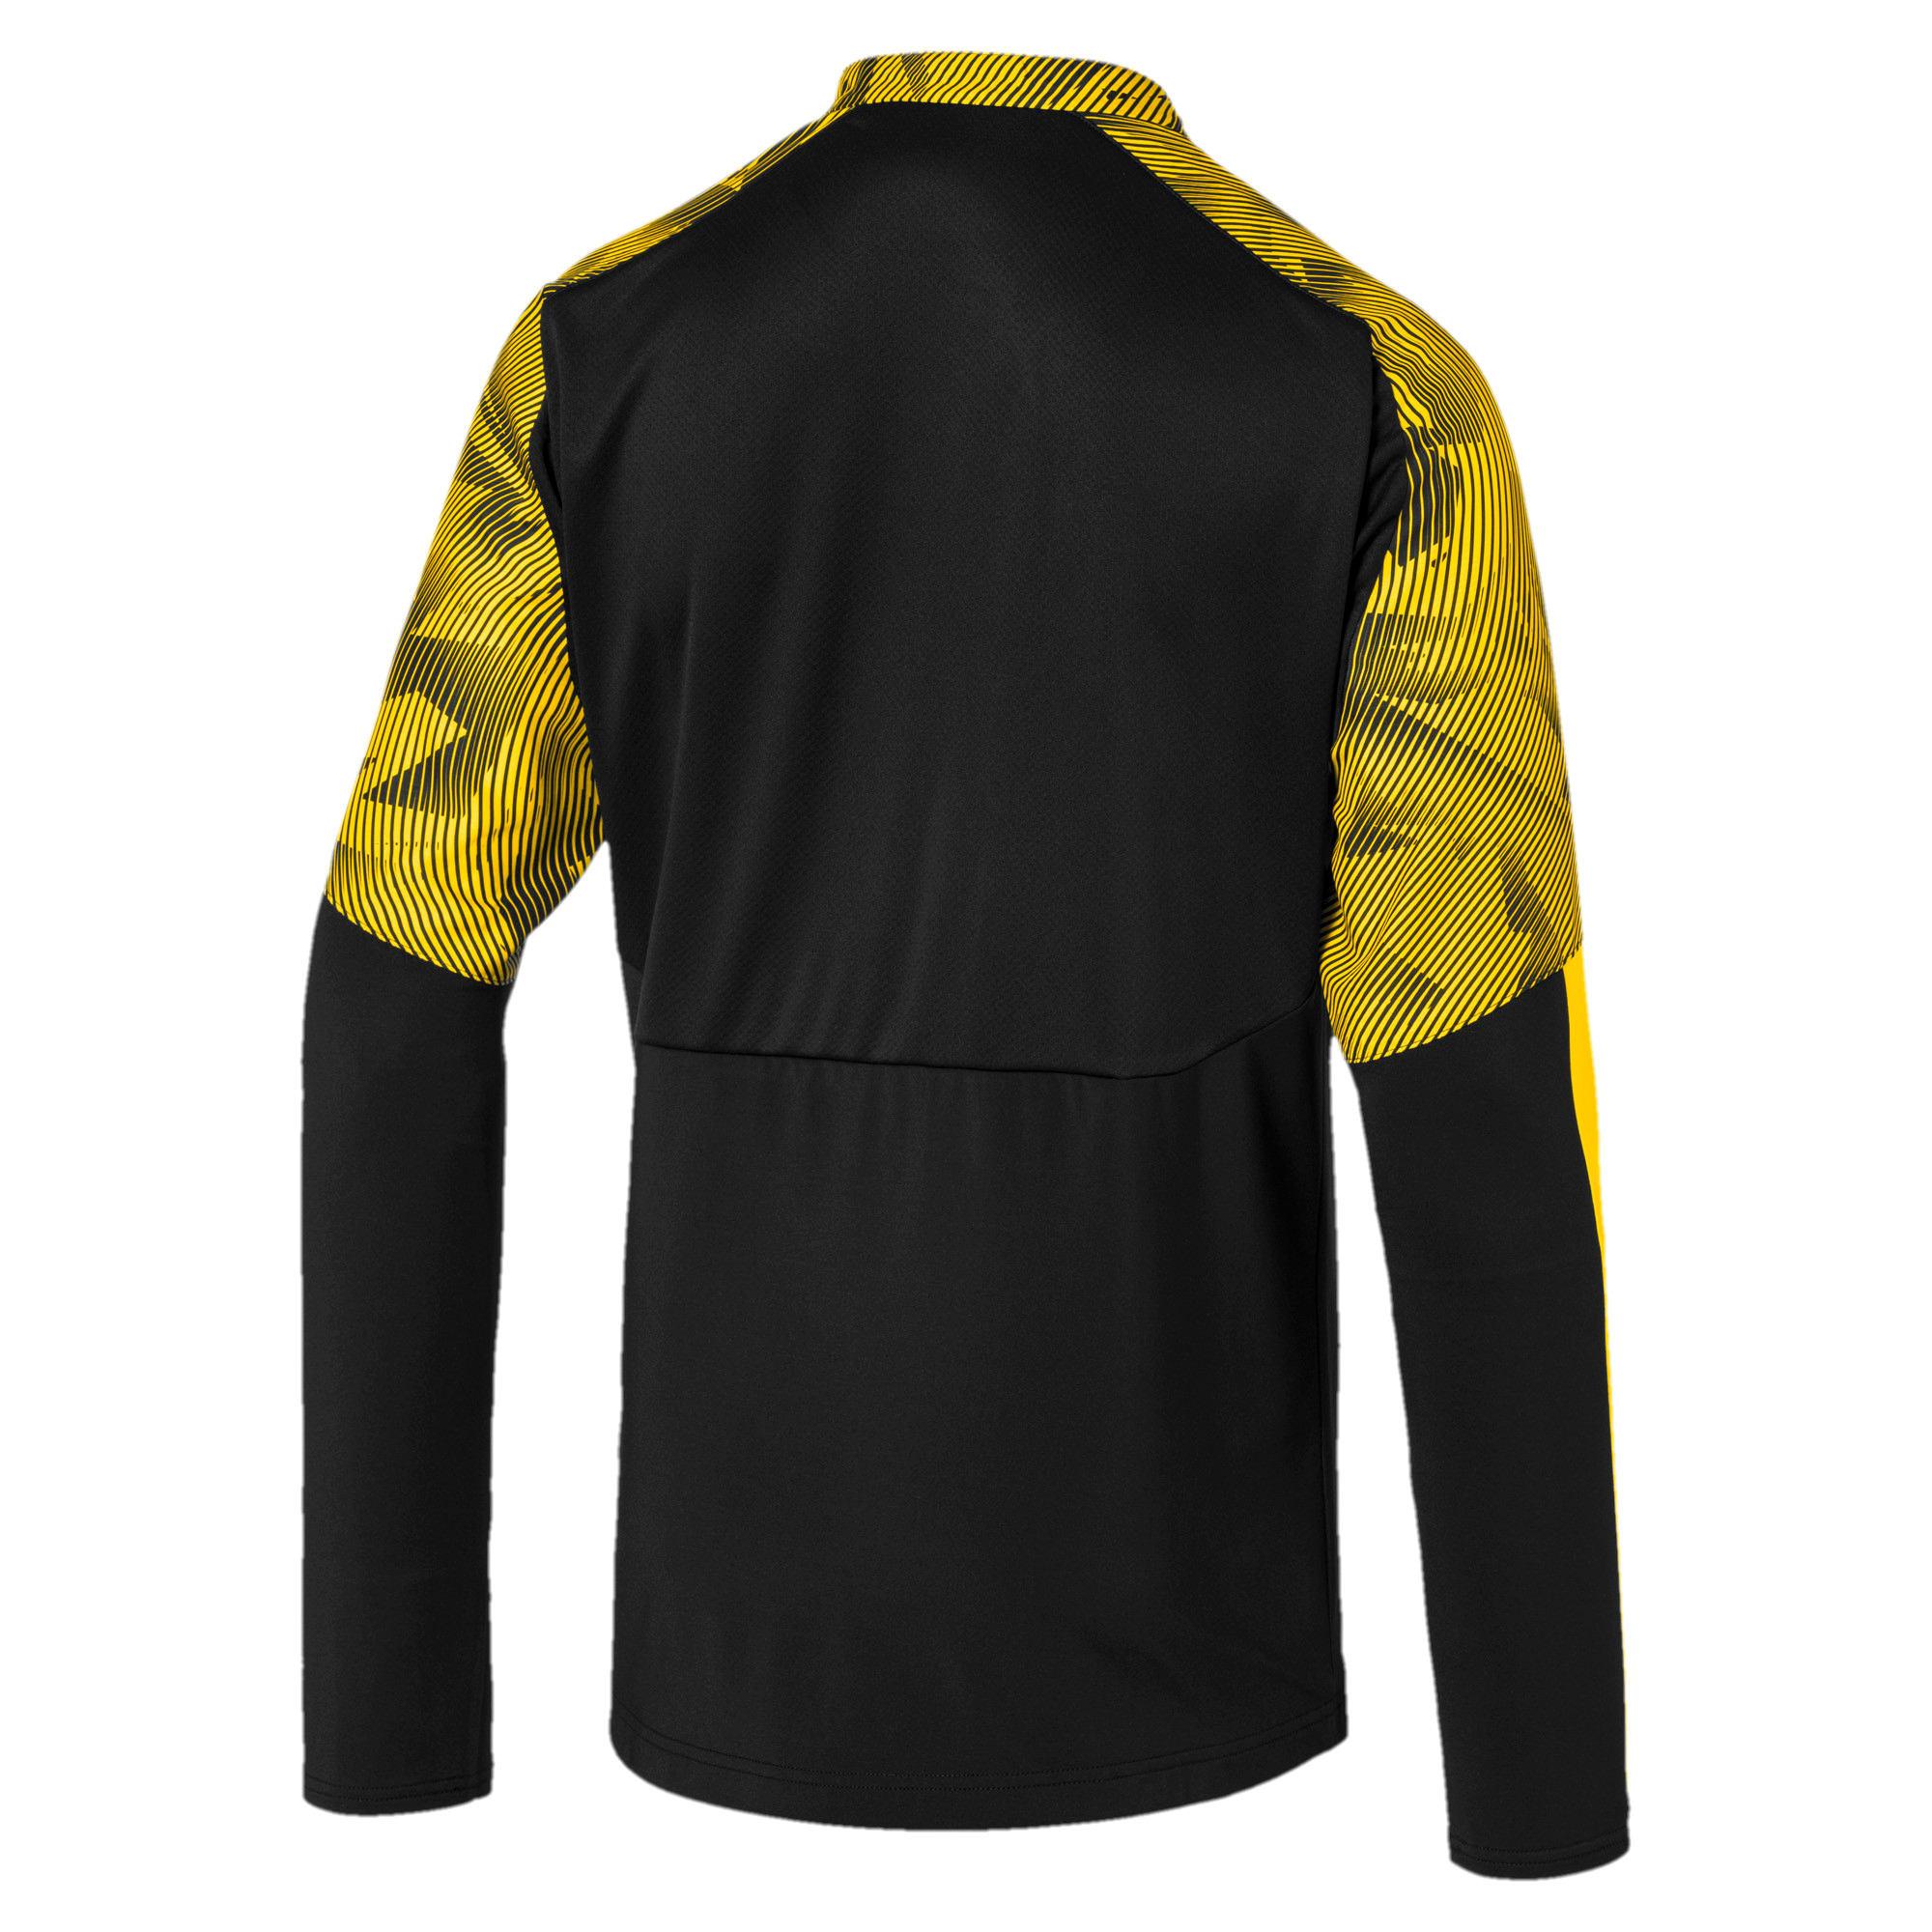 Thumbnail 5 of BVB Quarter Zip Men's Training Top, Puma Black-Cyber Yellow, medium